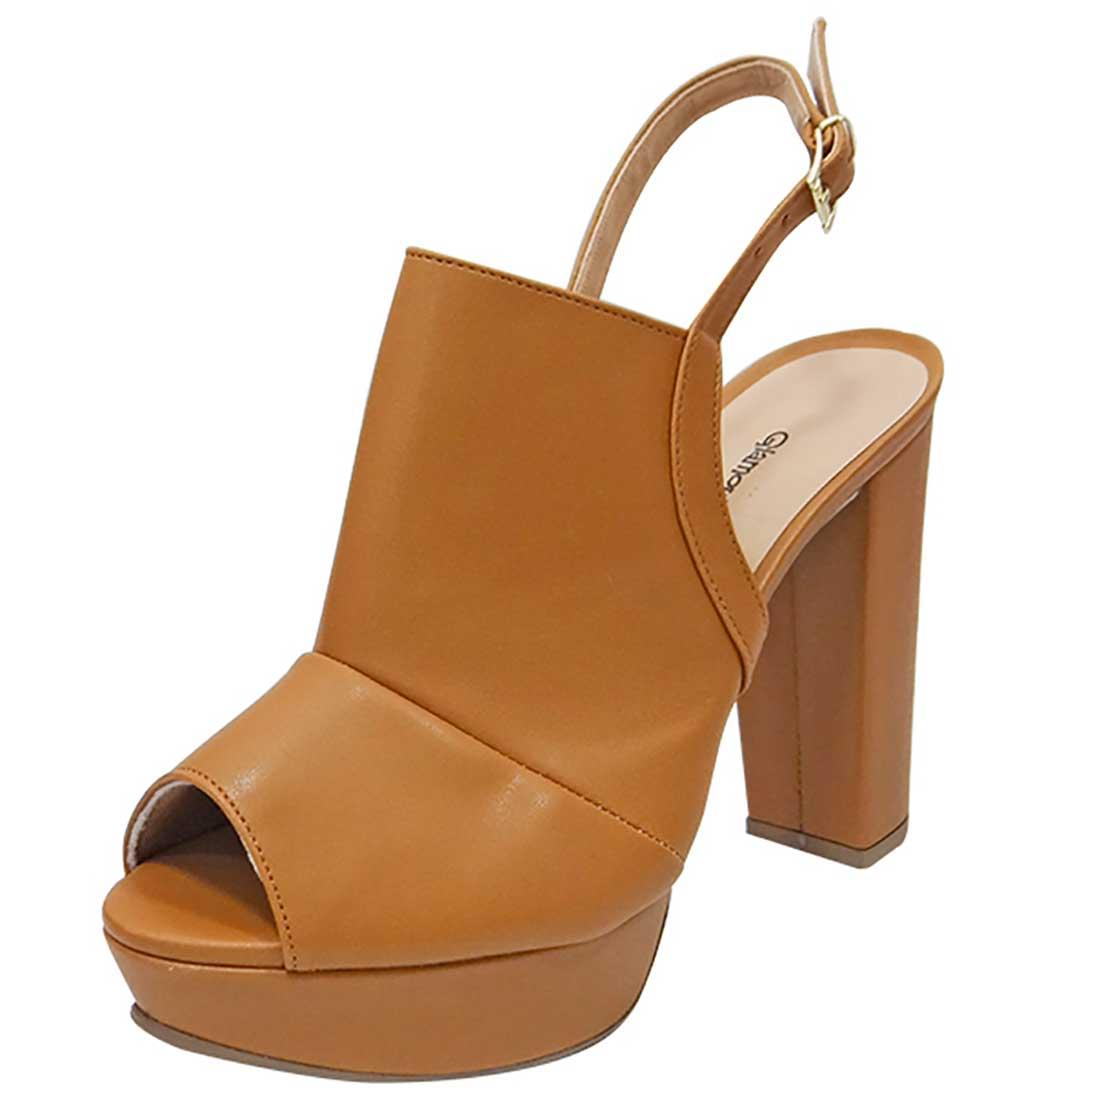 Sandal Boot Meia Pata - Caramelo